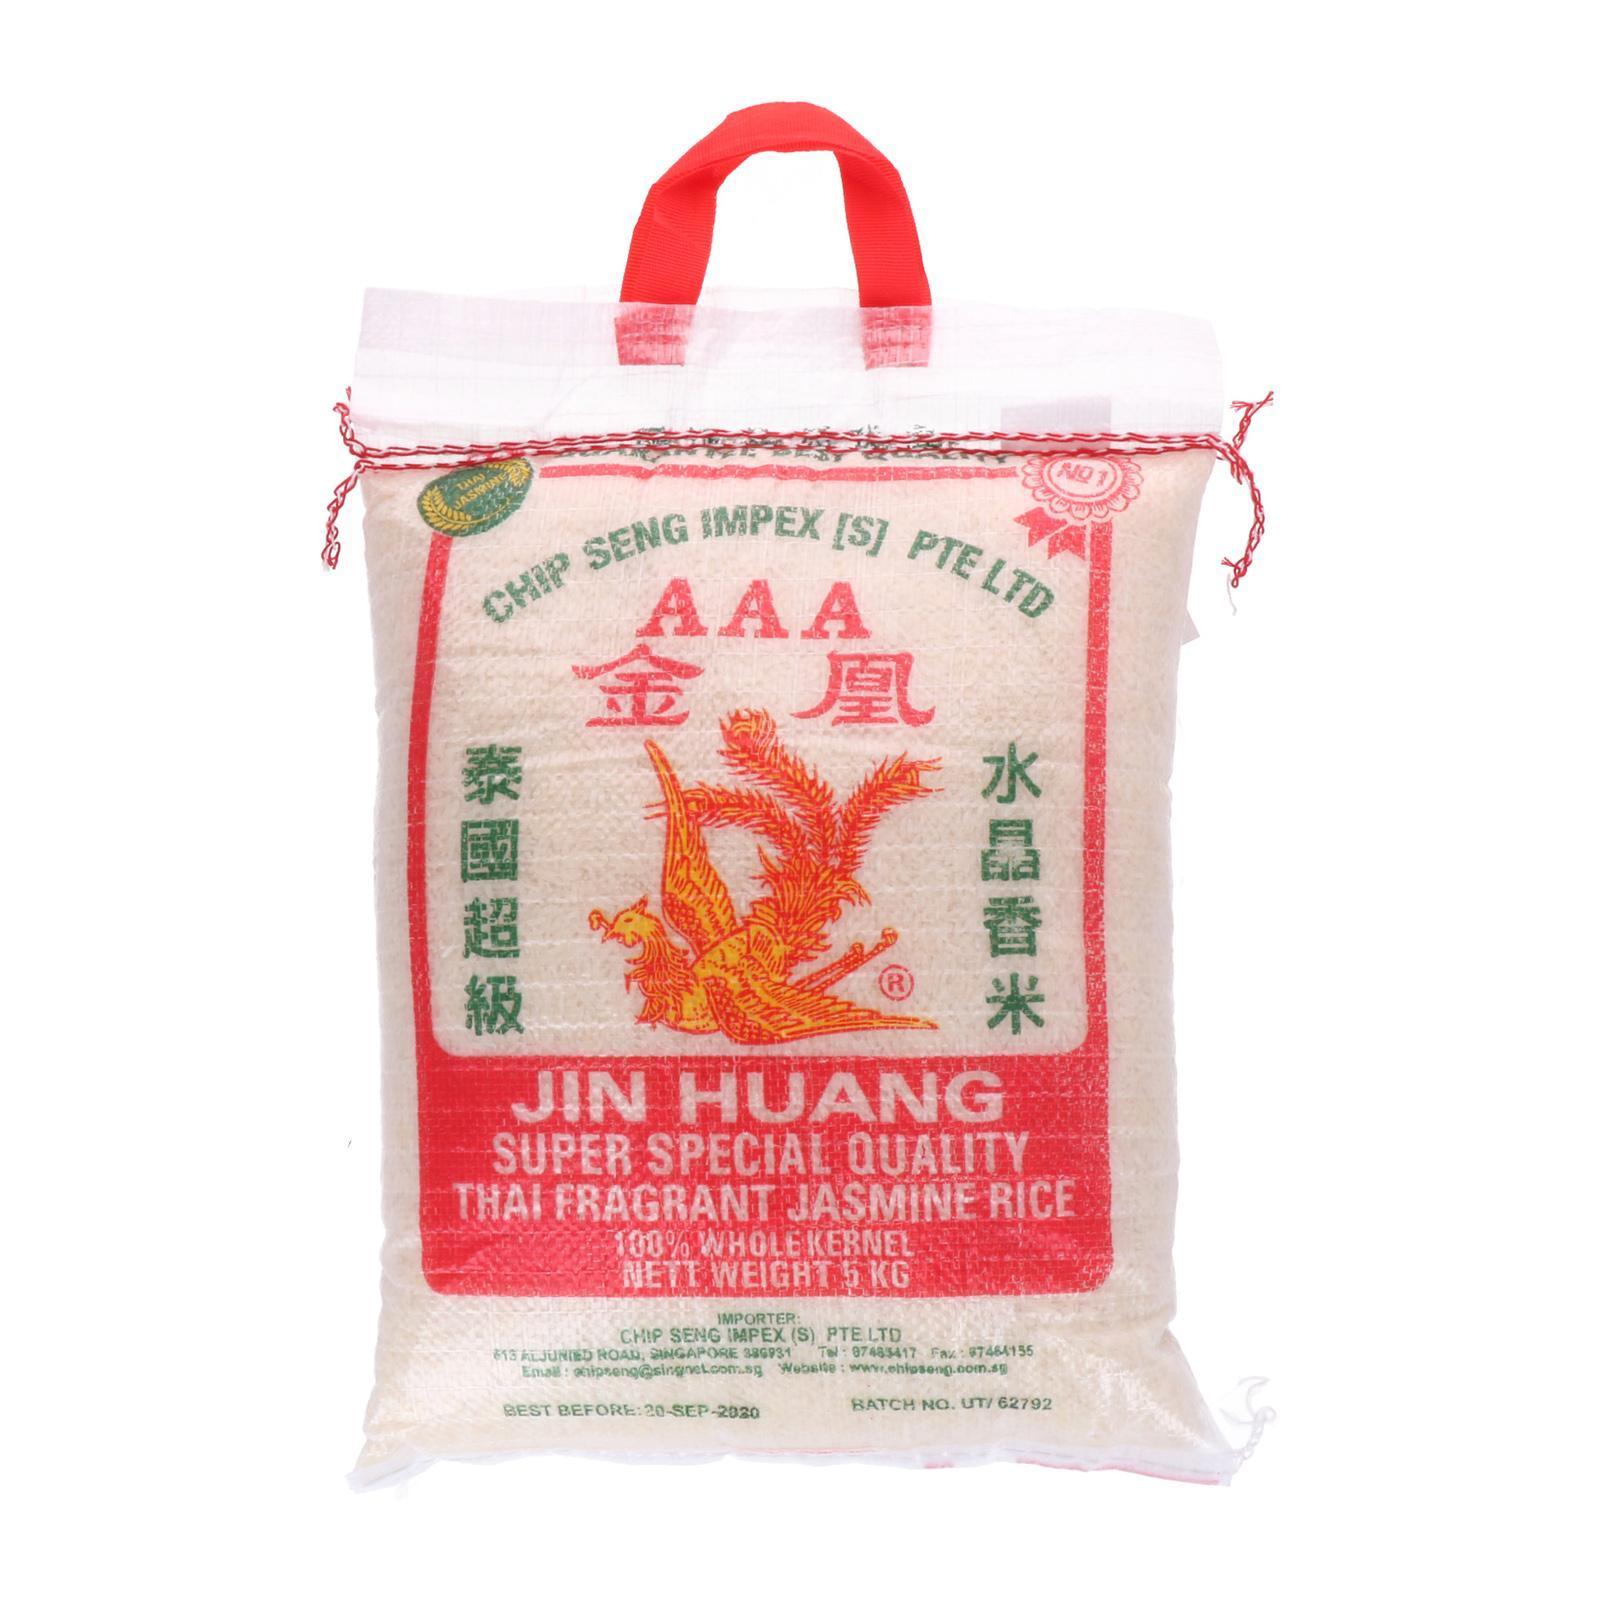 Jin Huang Thai Fragrant Rice - By Chip Seng Impex